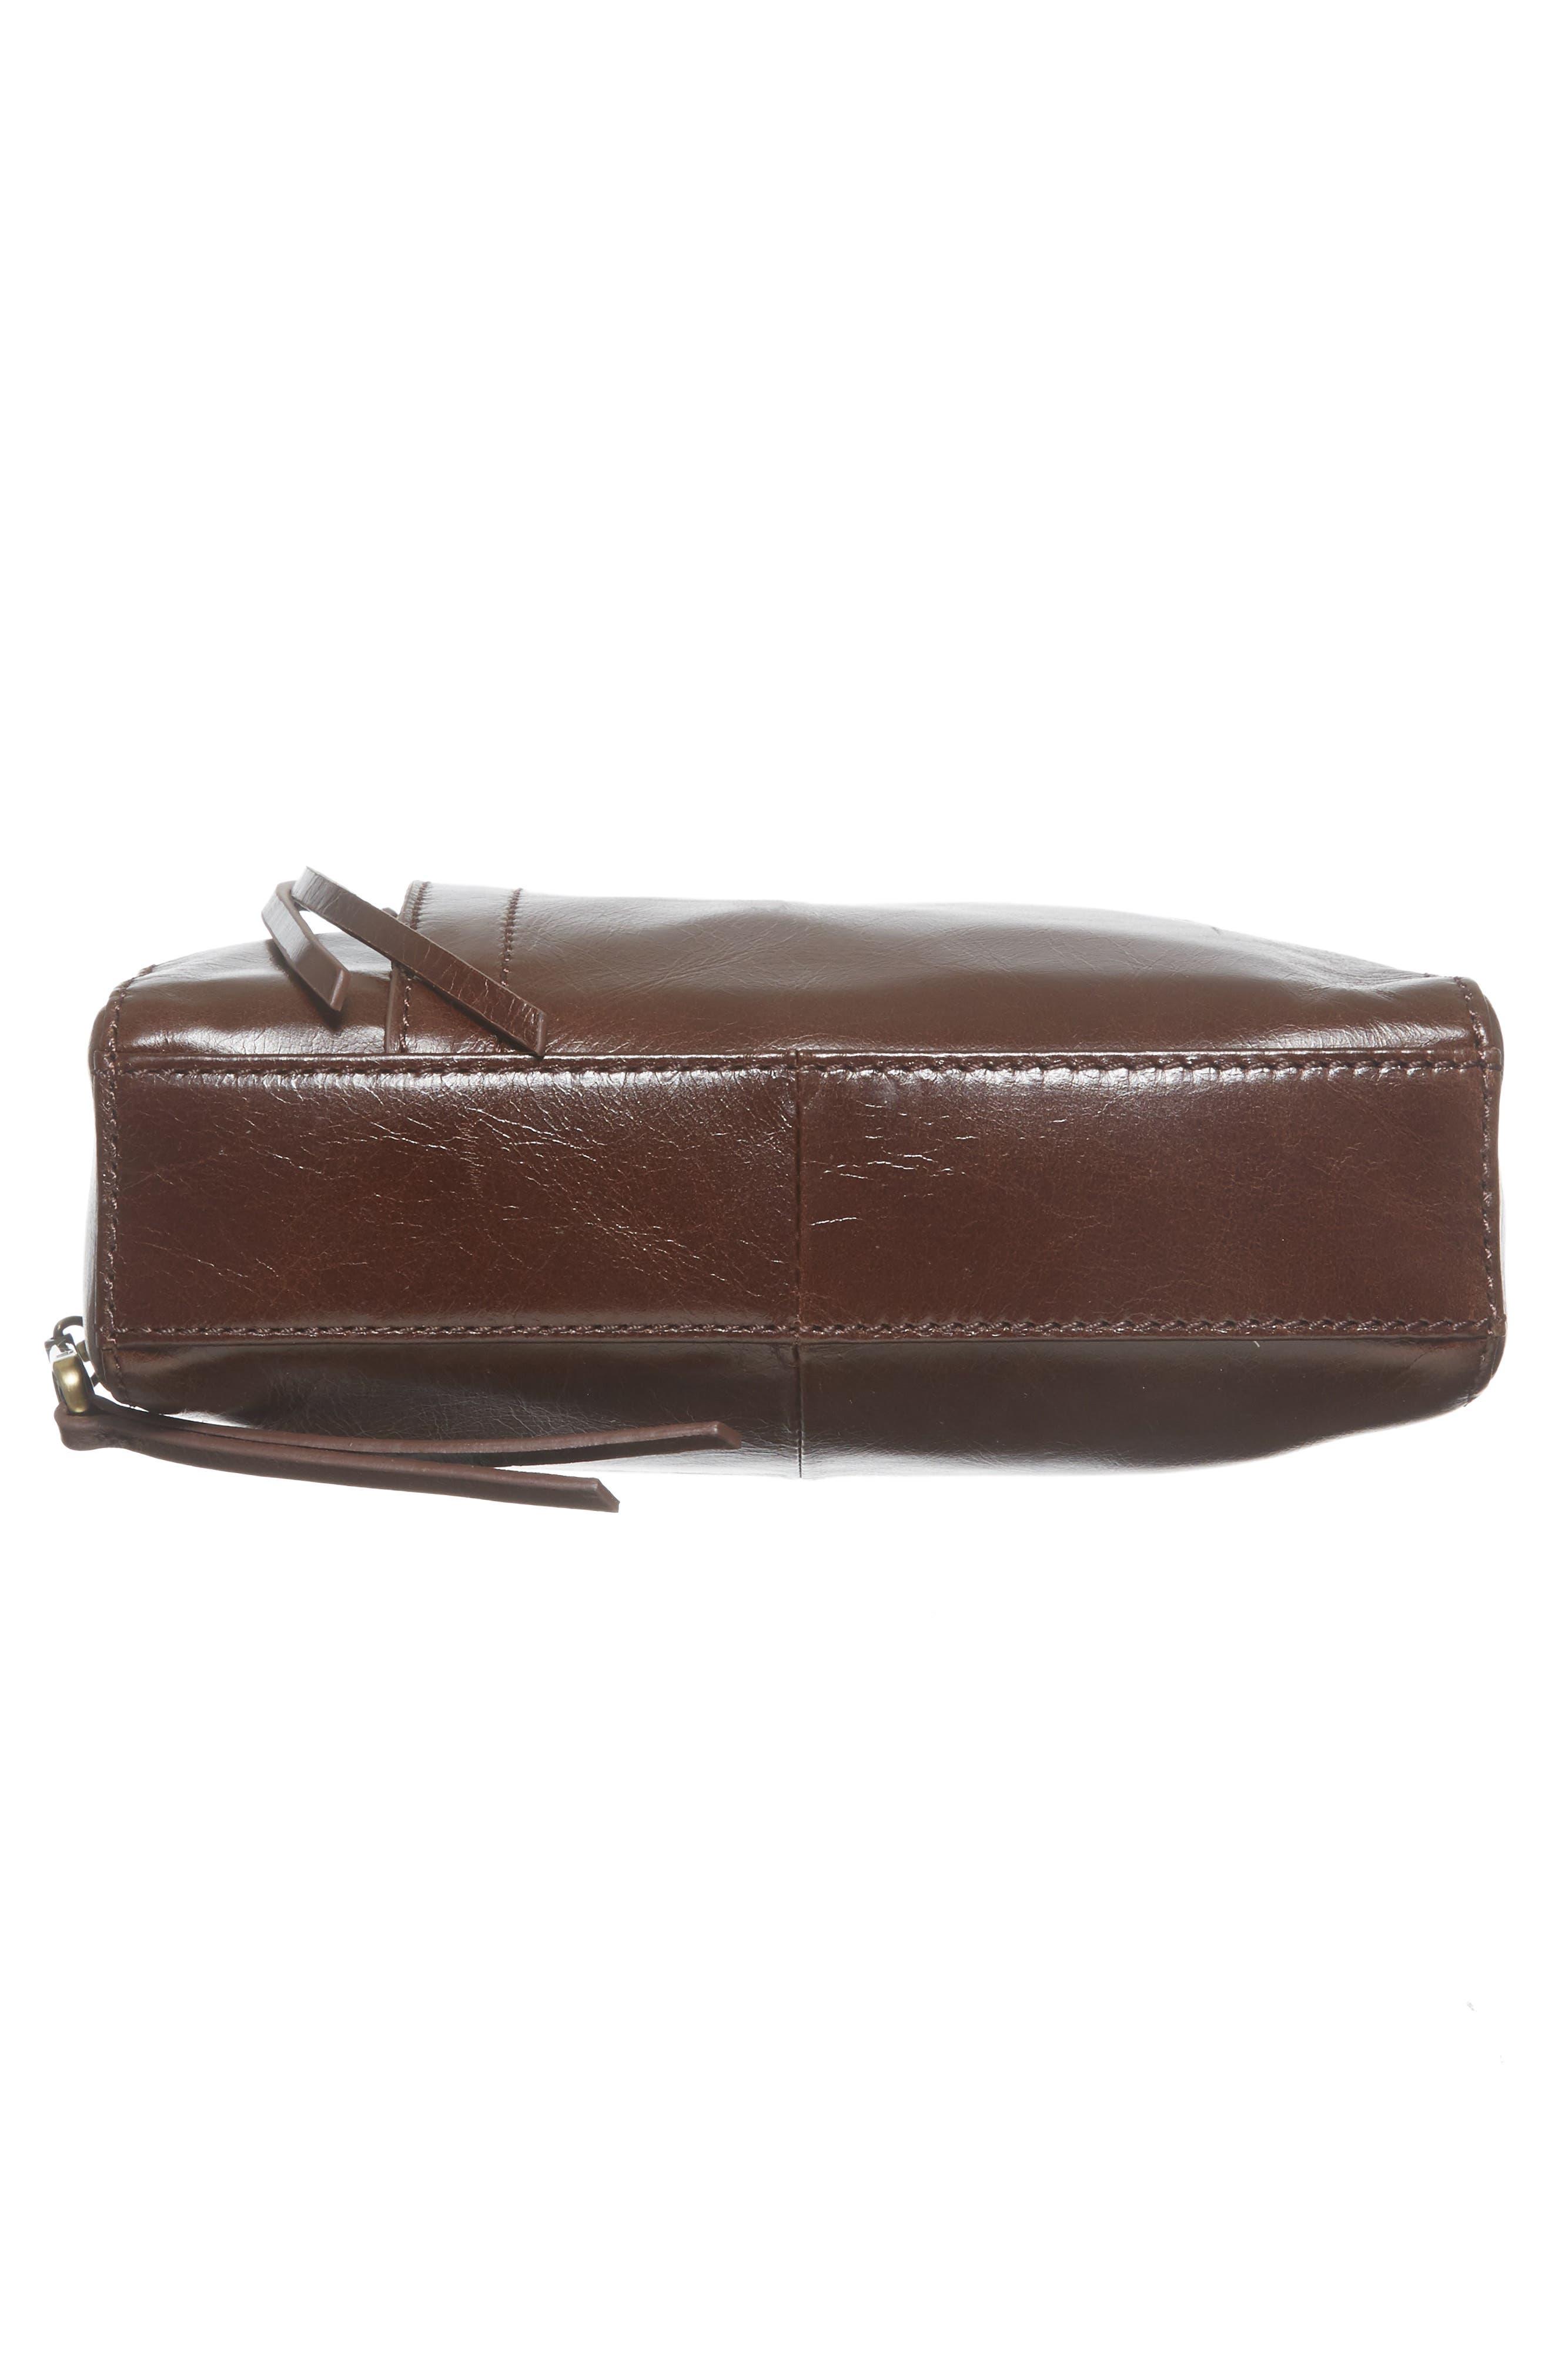 Lyric Leather Crossbody Bag,                             Alternate thumbnail 6, color,                             Espresso